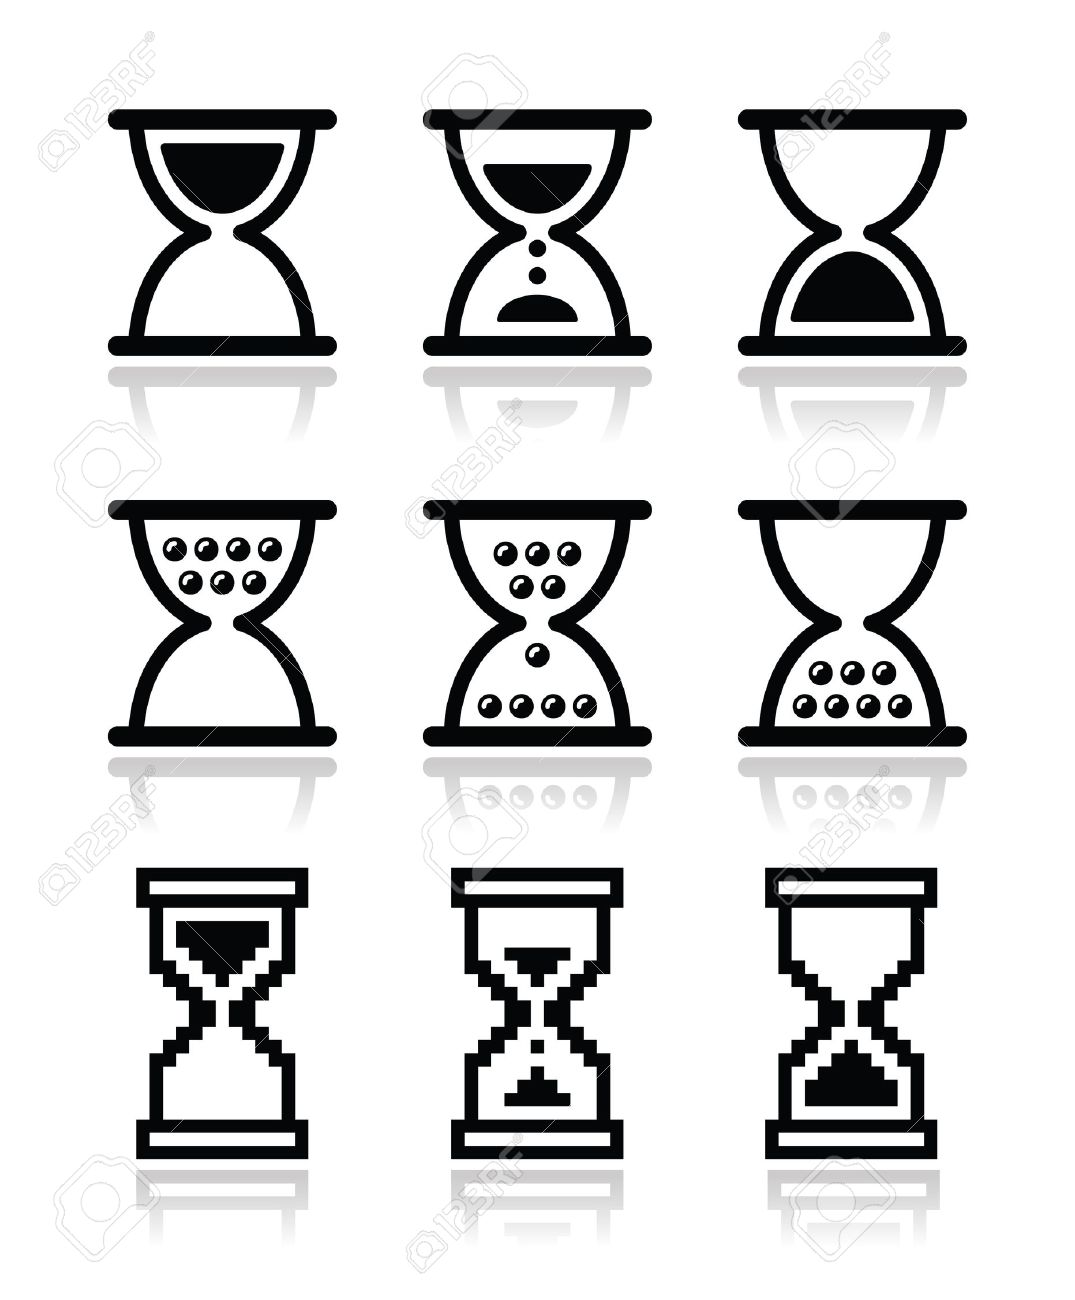 Sanduhr icon  Sanduhr, Sanduhr-Icon-Set Lizenzfrei Nutzbare Vektorgrafiken, Clip ...